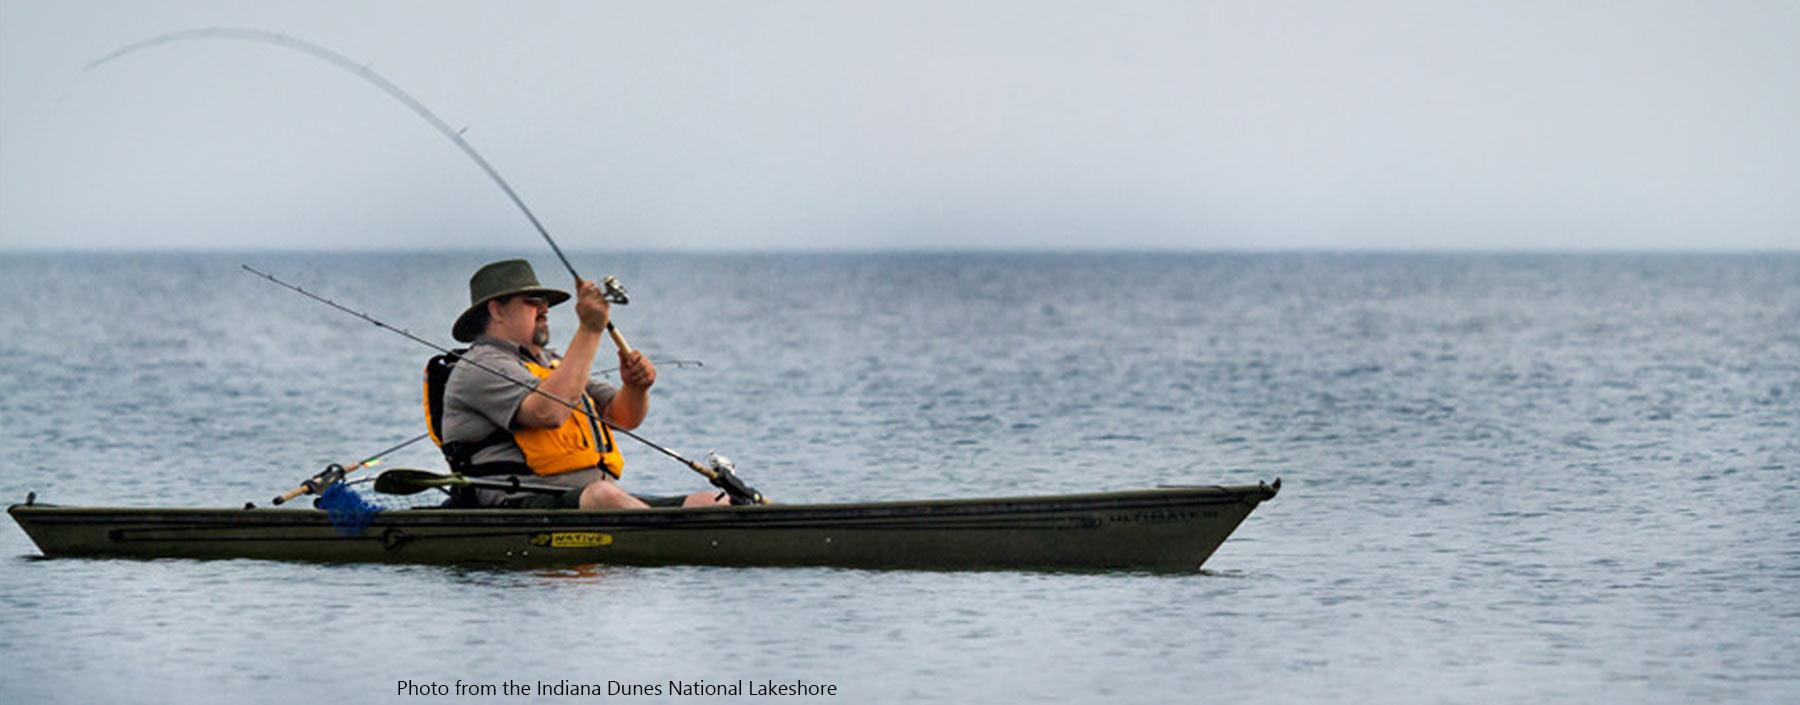 Fishing at the indiana dunes | lake michigan fishing.